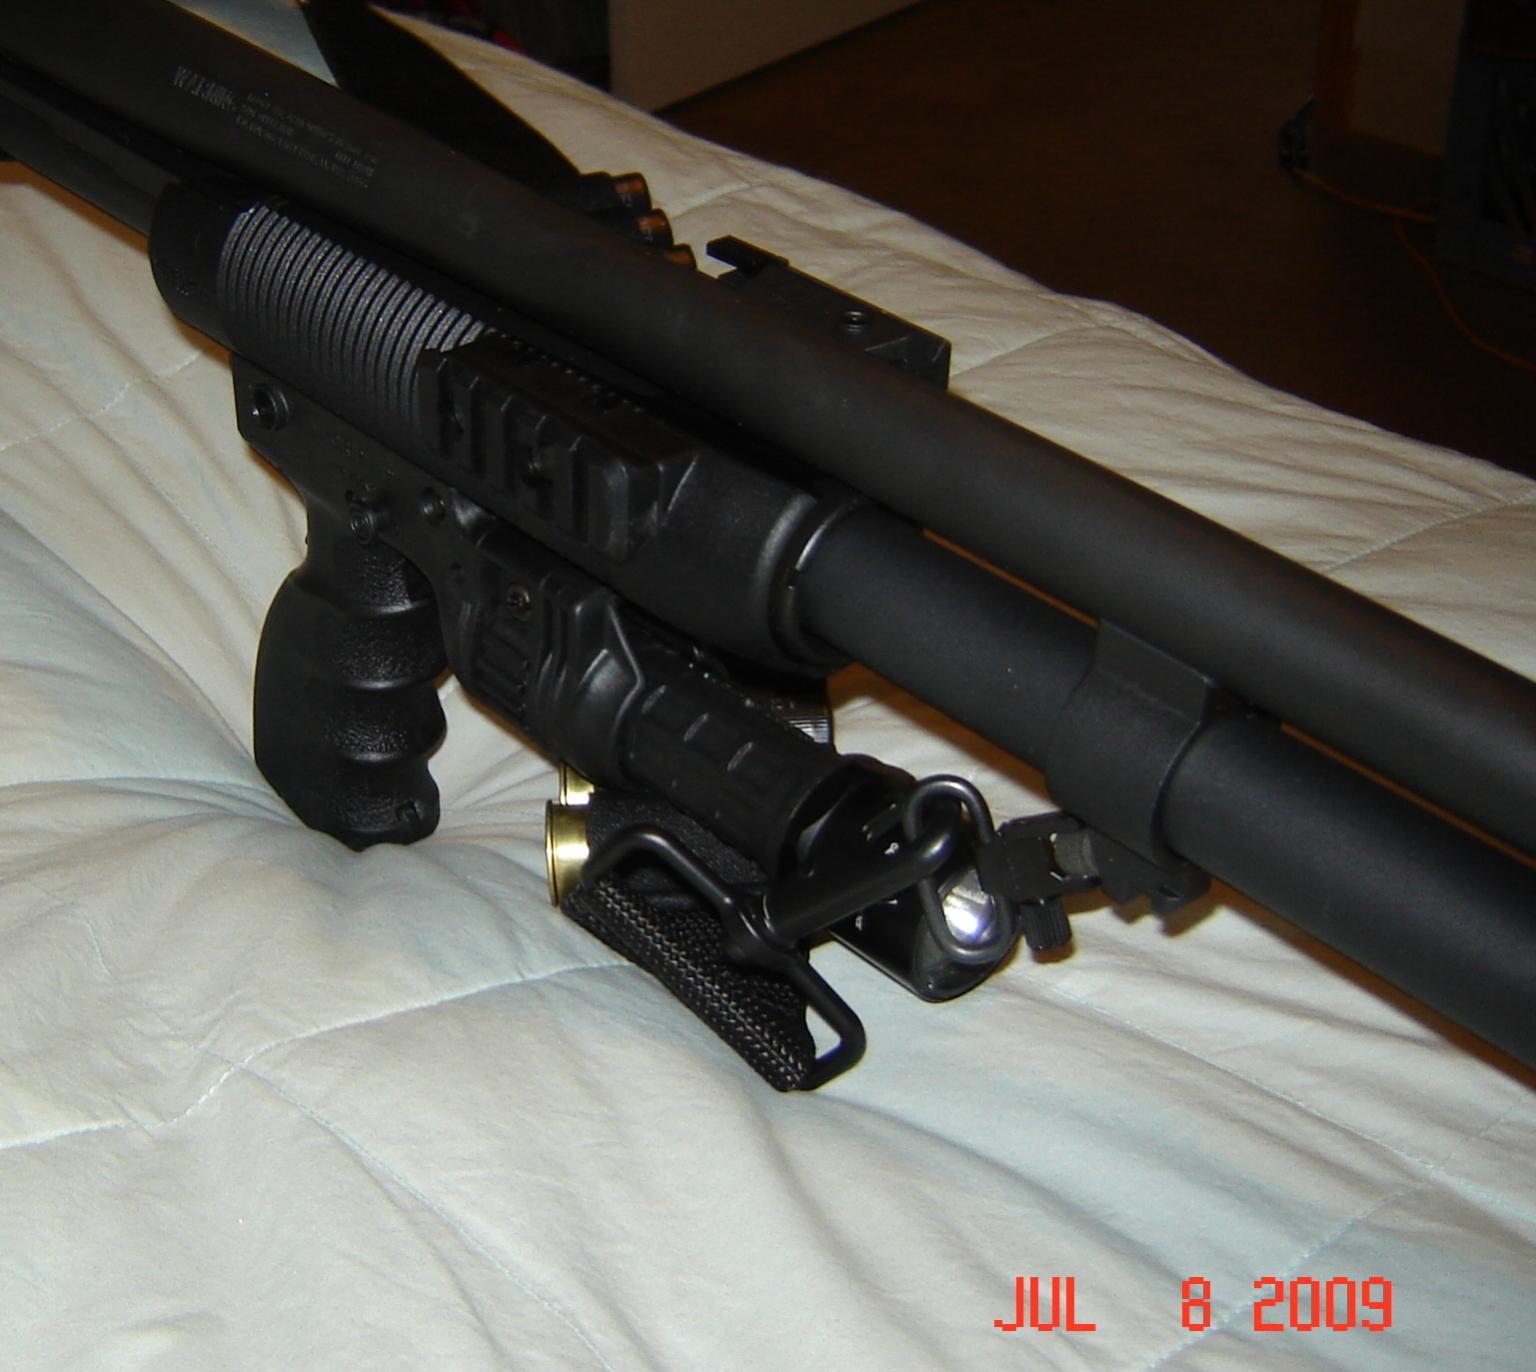 Recommendations for BRIGHT light for Mossberg 500-pistol-grip-pump-003.jpg